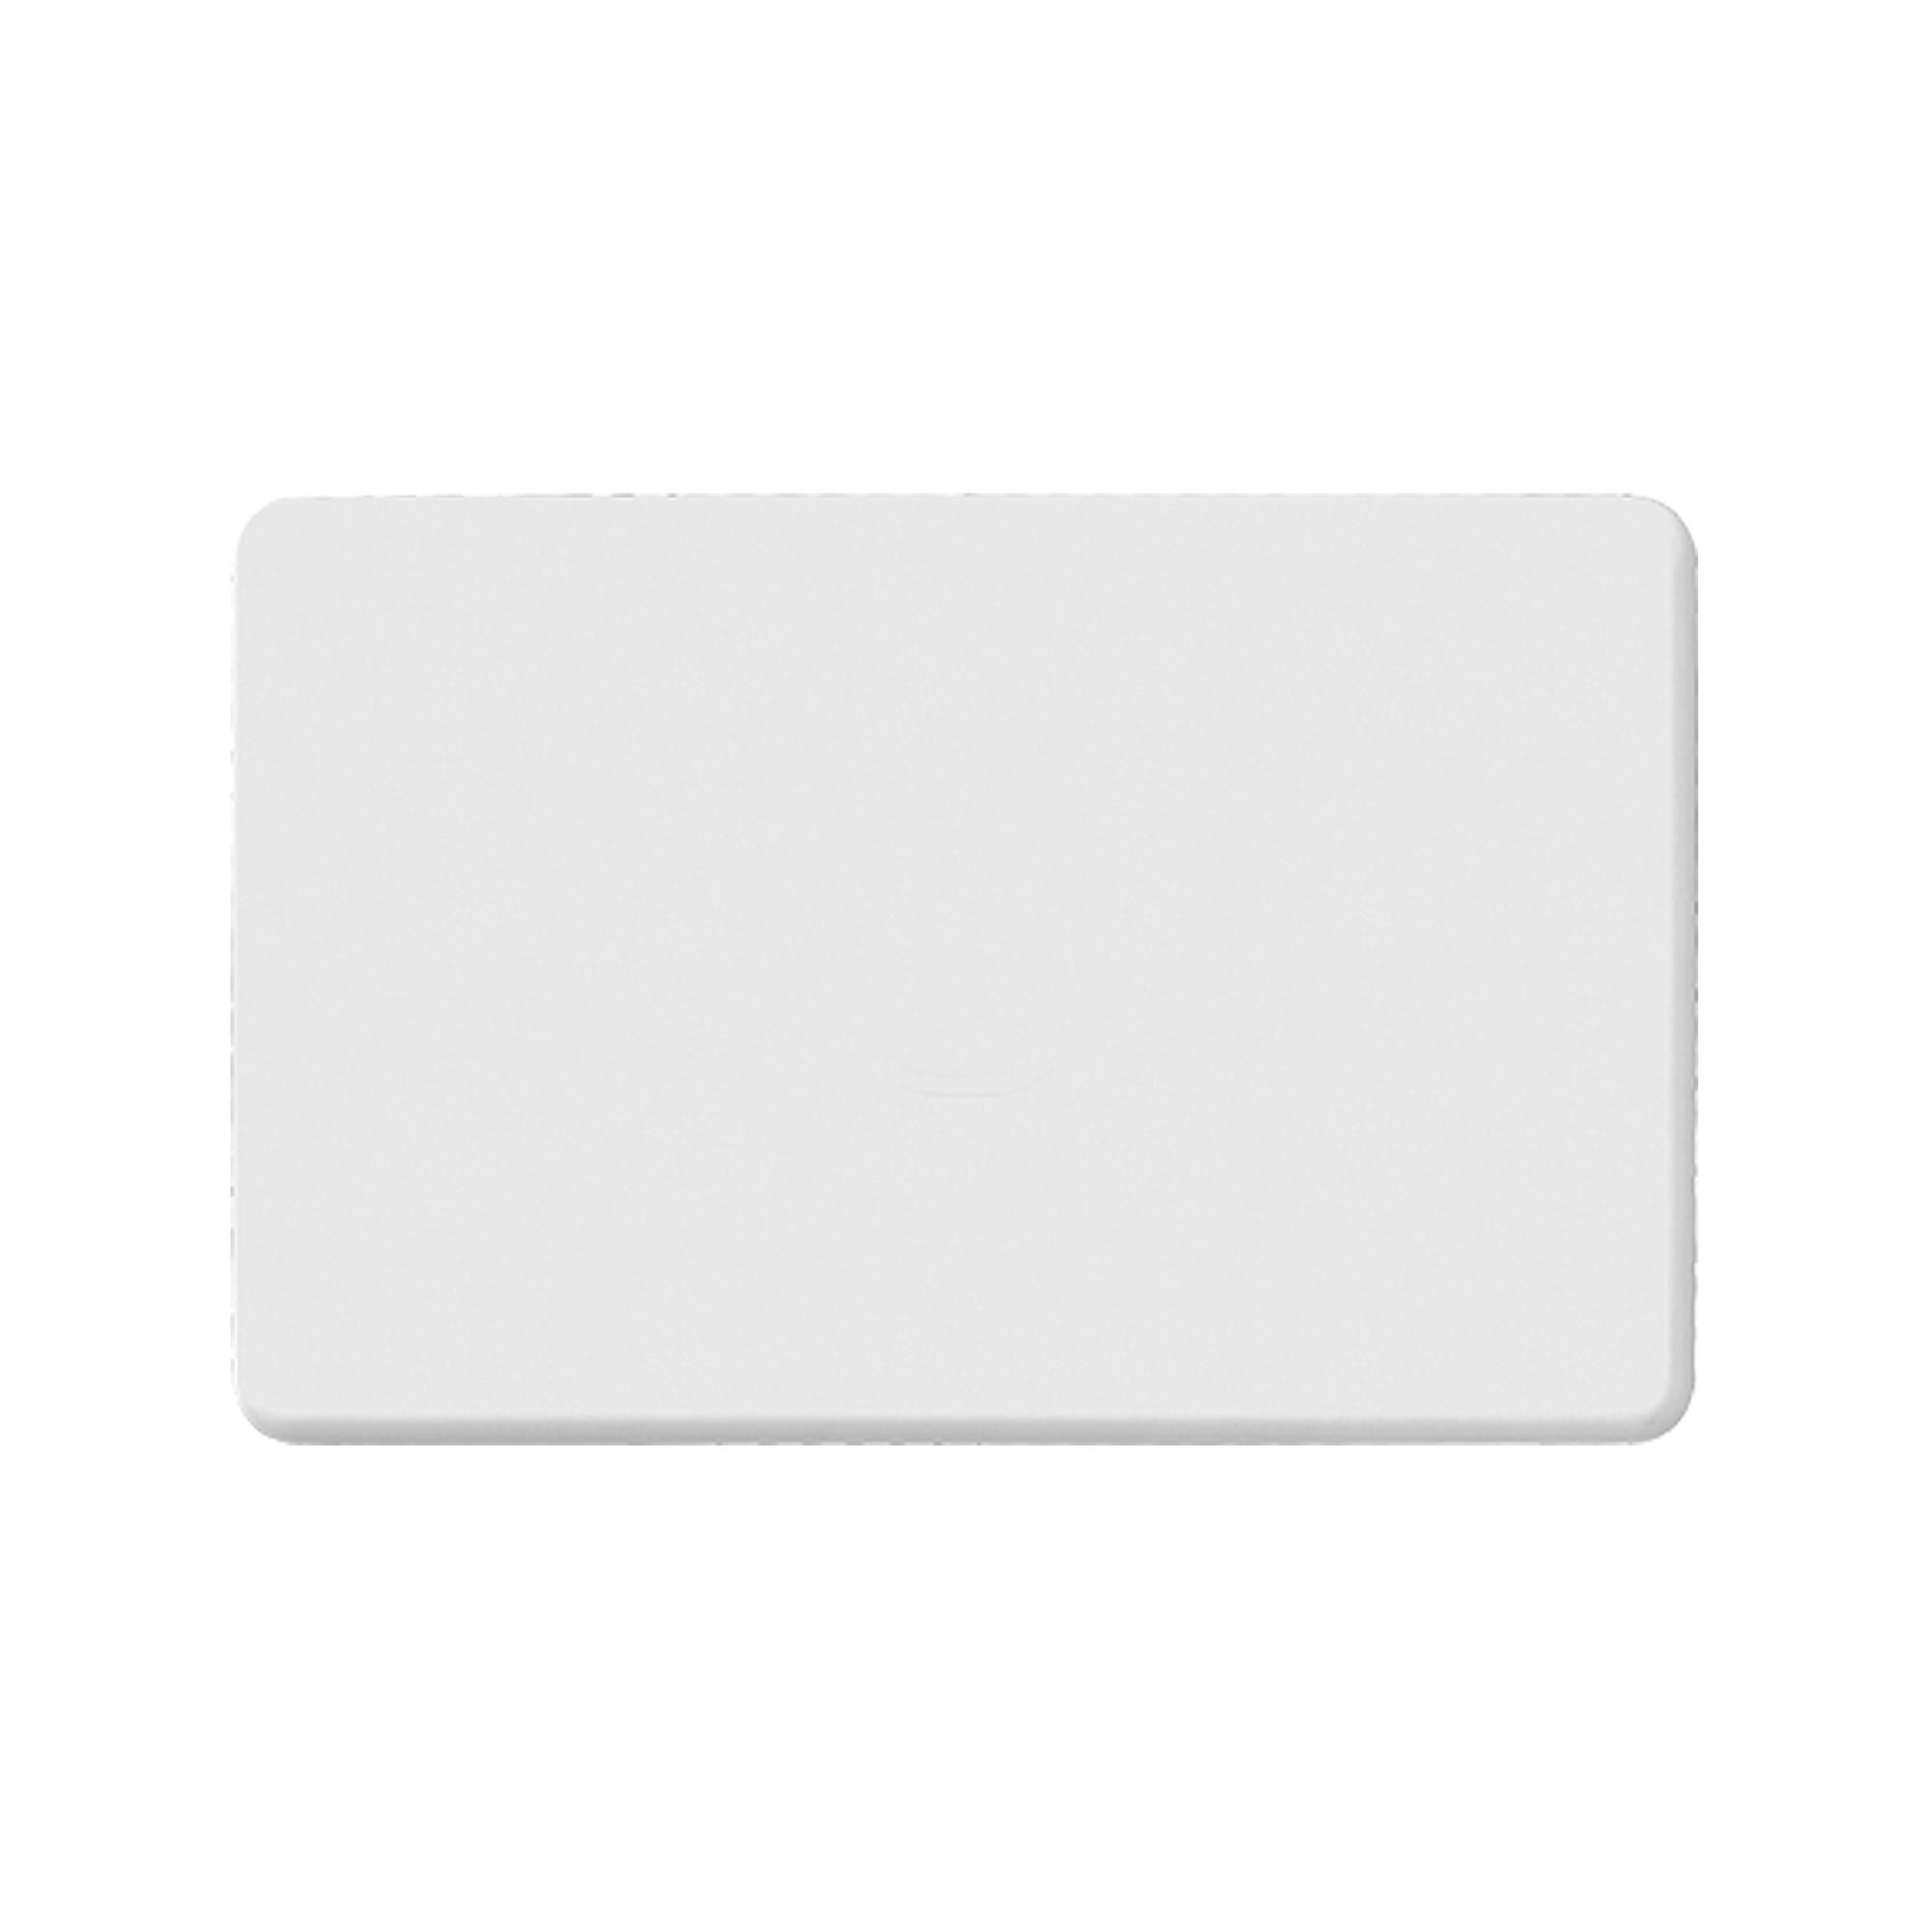 Deta x6 blank wall plate